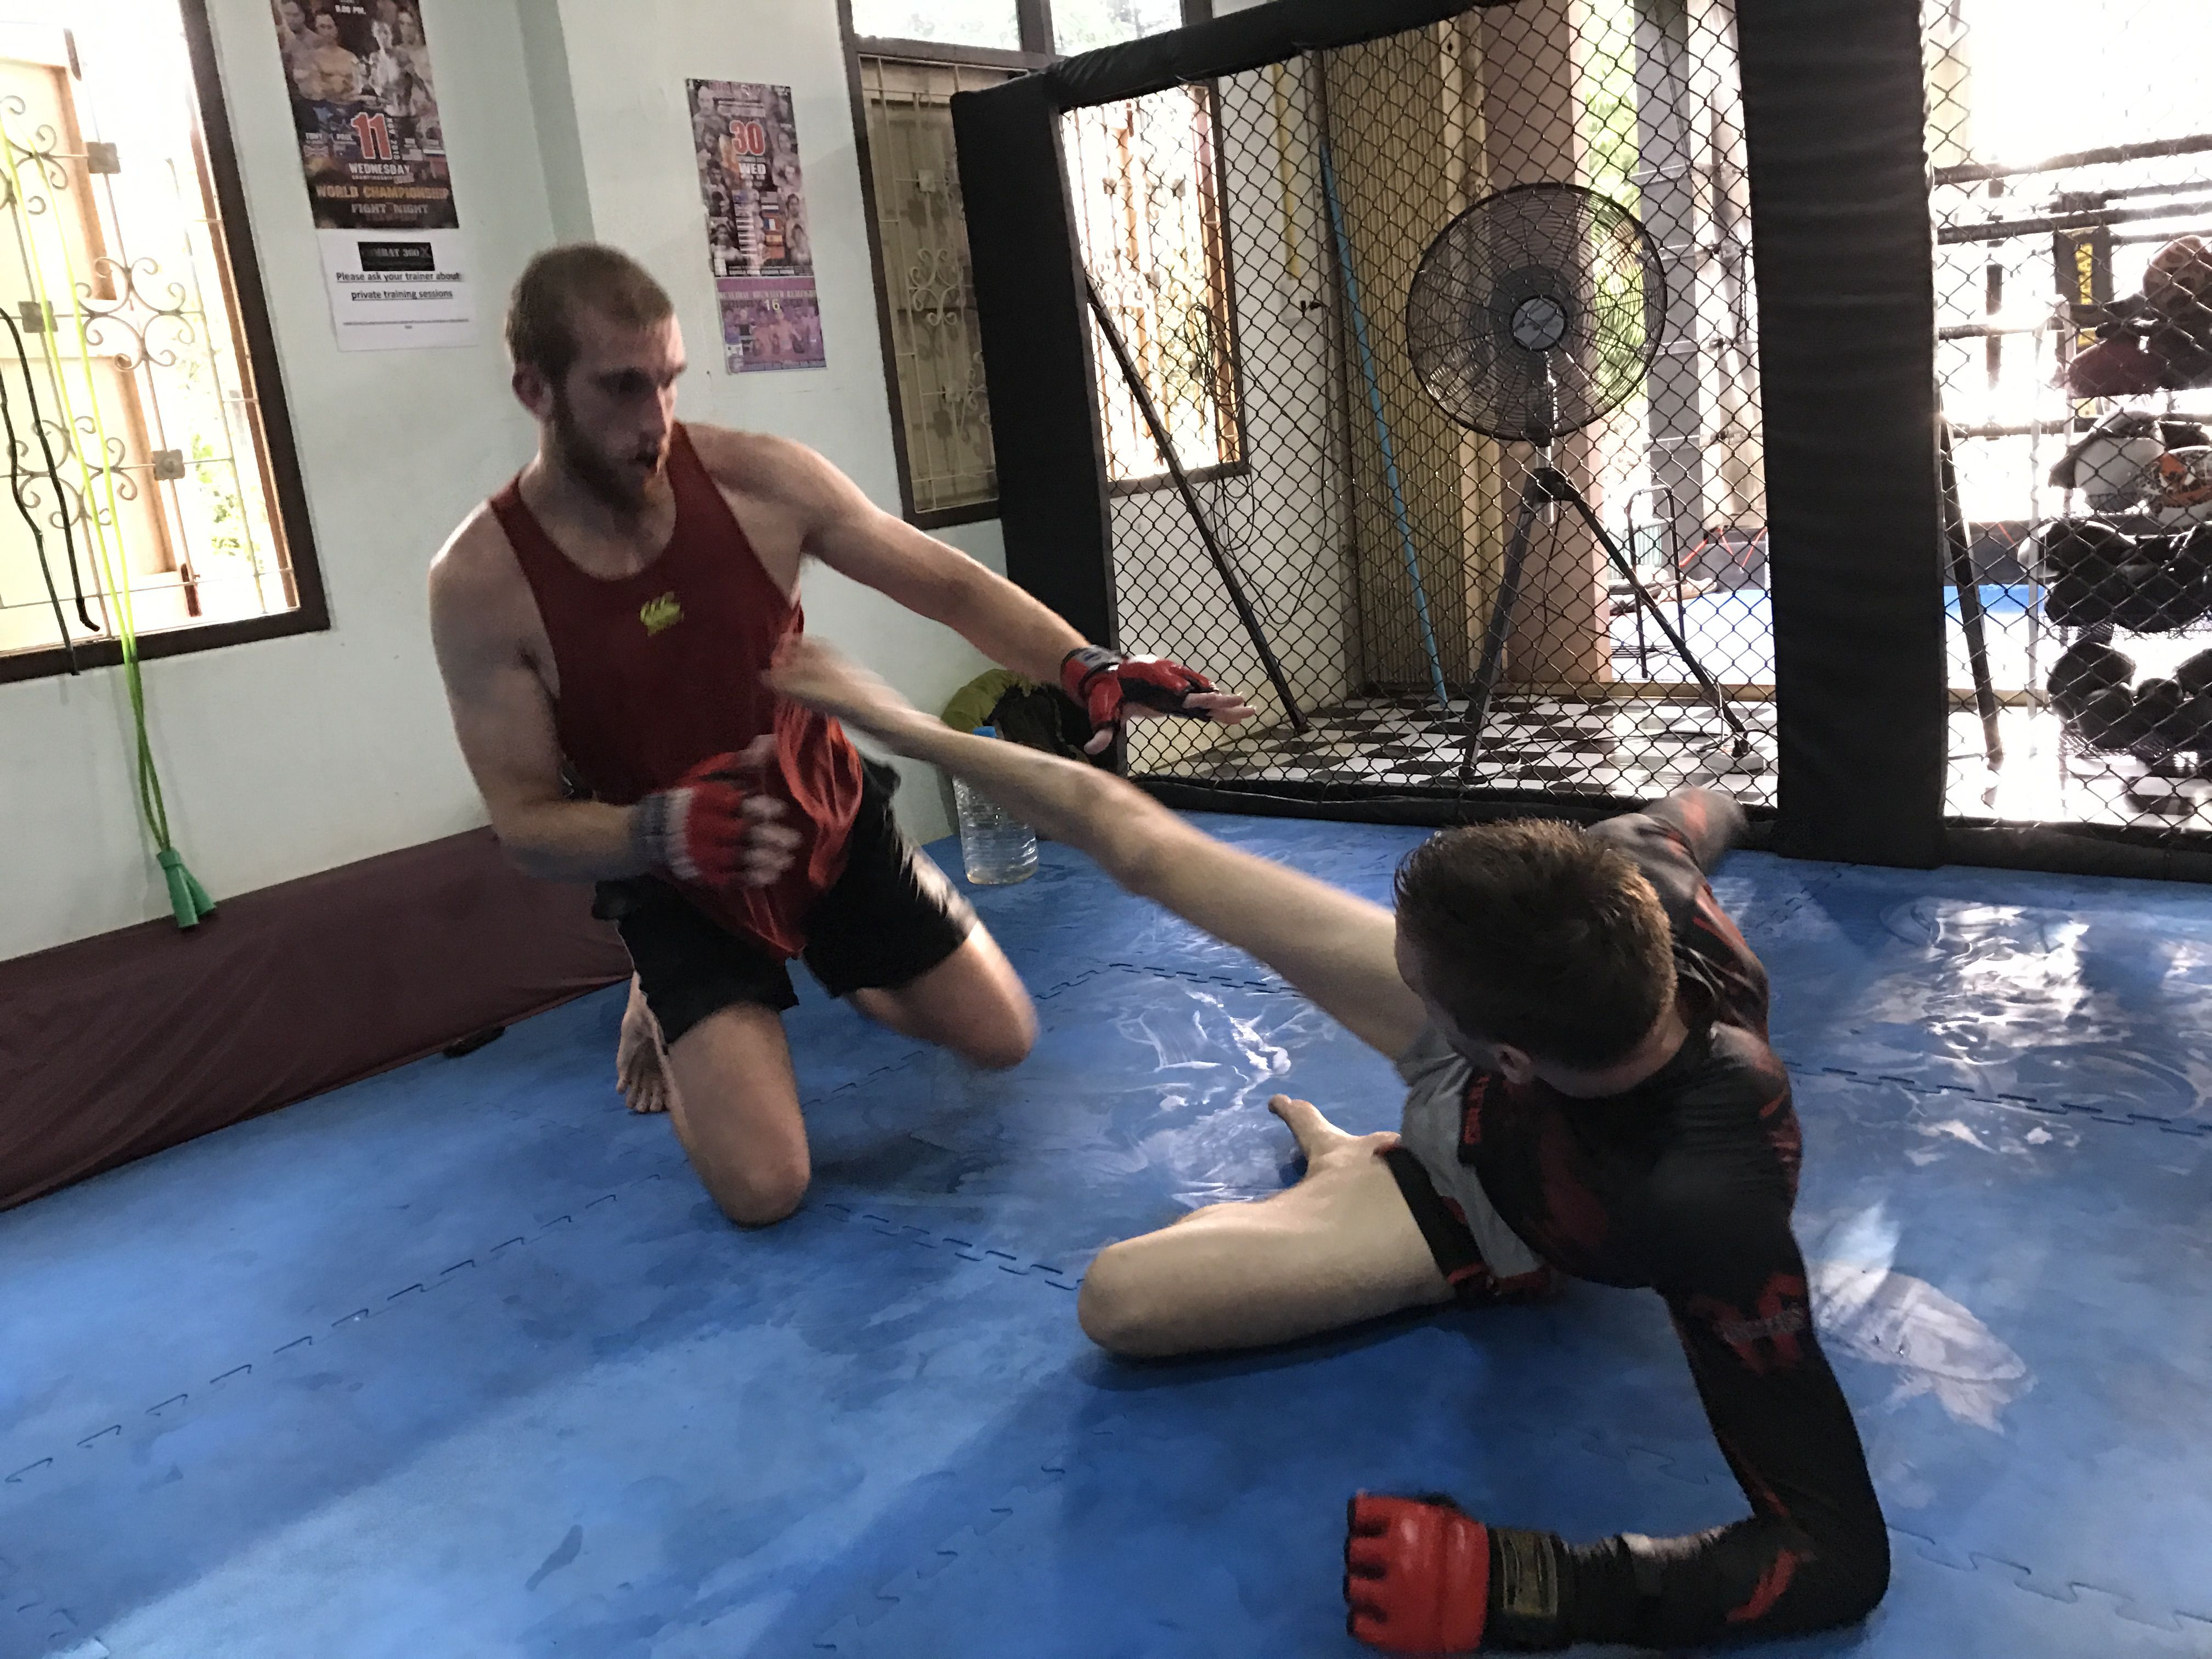 Mma Training At Combat 360x Muay Thai Mma And Fitness Camp In Khao Lak Thailand Mma Muaythai Nakmuay Gym Fitness Wo Mma Training Muay Thai Fitness Camp